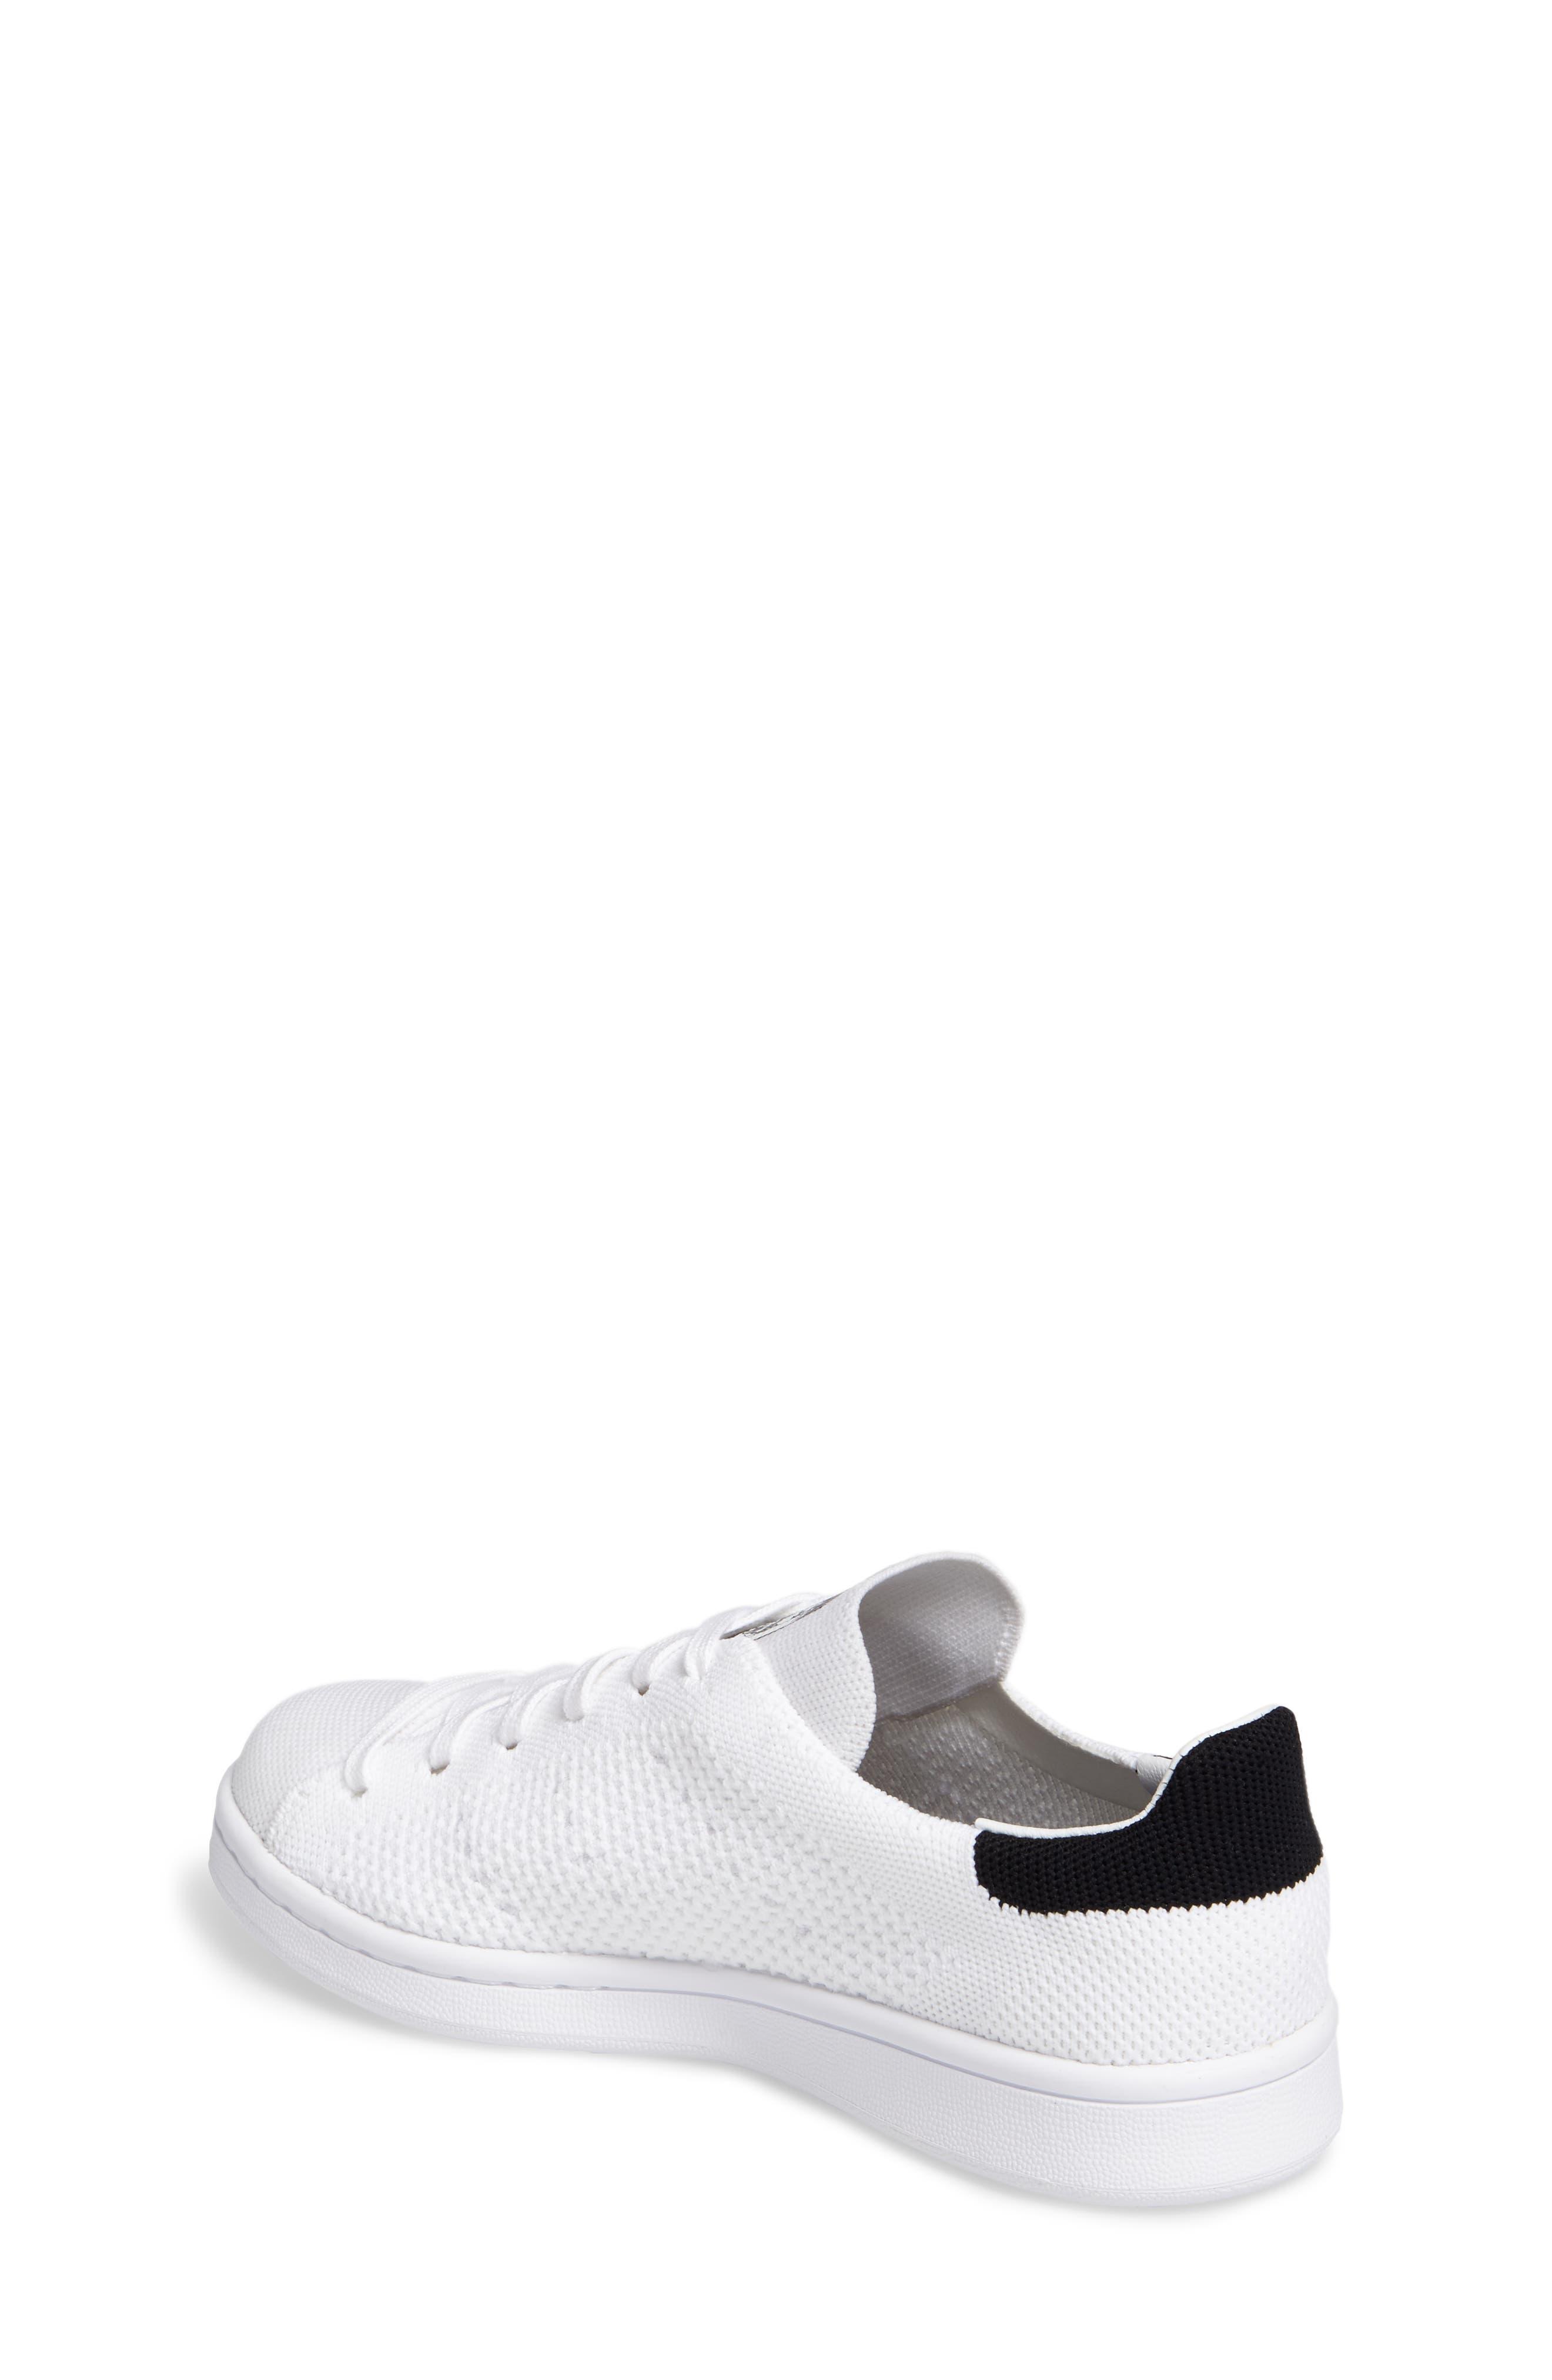 Stan Smith Primeknit Sneaker,                             Alternate thumbnail 2, color,                             100